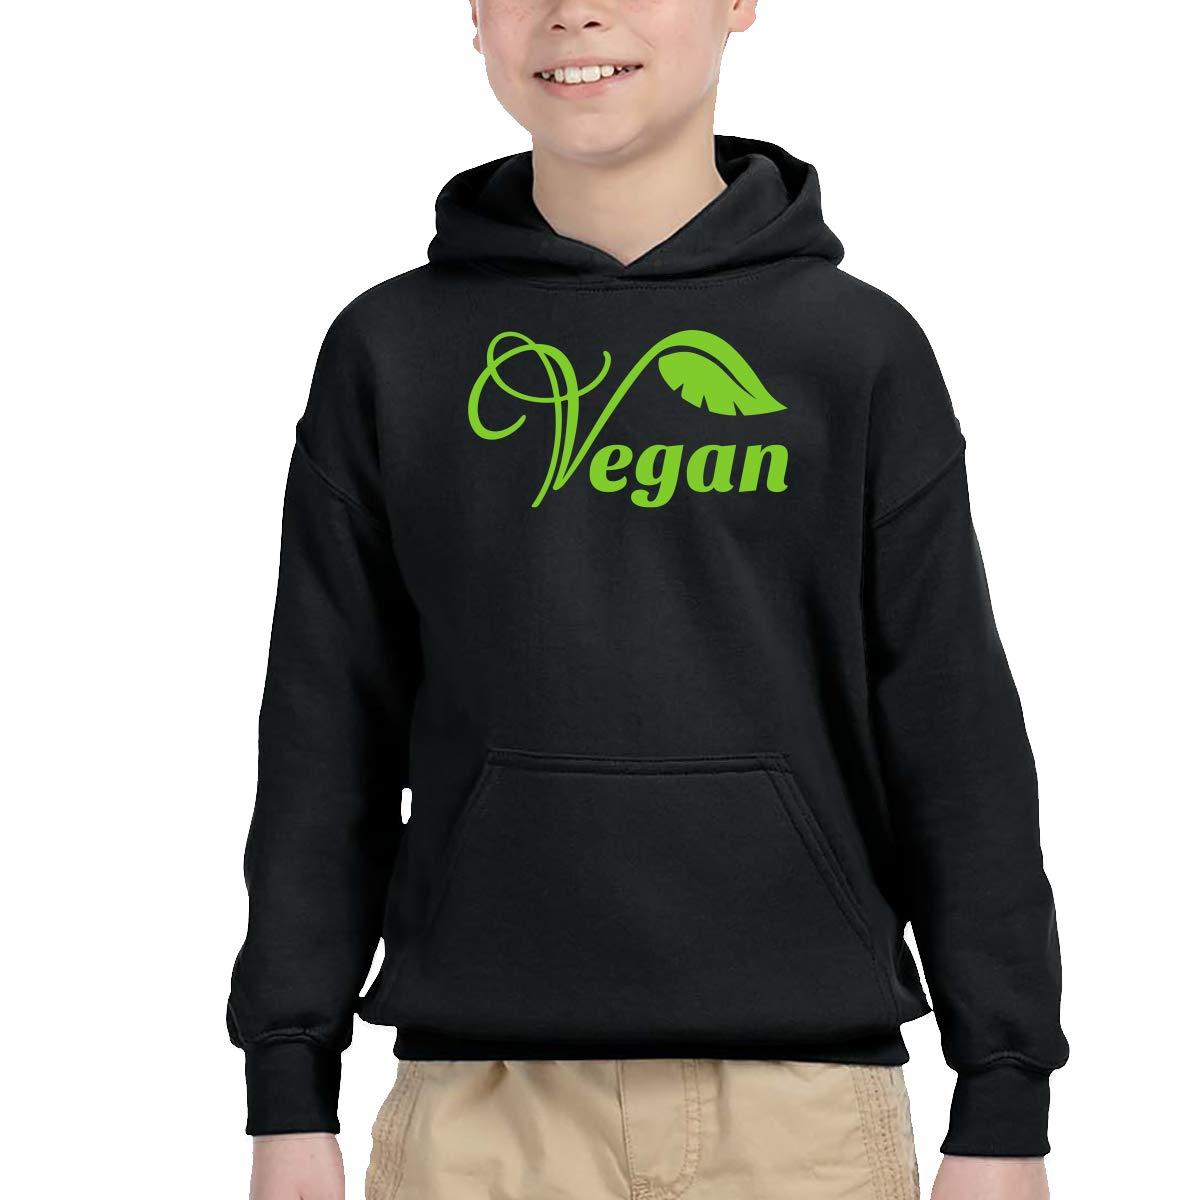 YTH/&123 Toddler Boys Girls Pullover Hoodie Fleece Vegan Outerwears